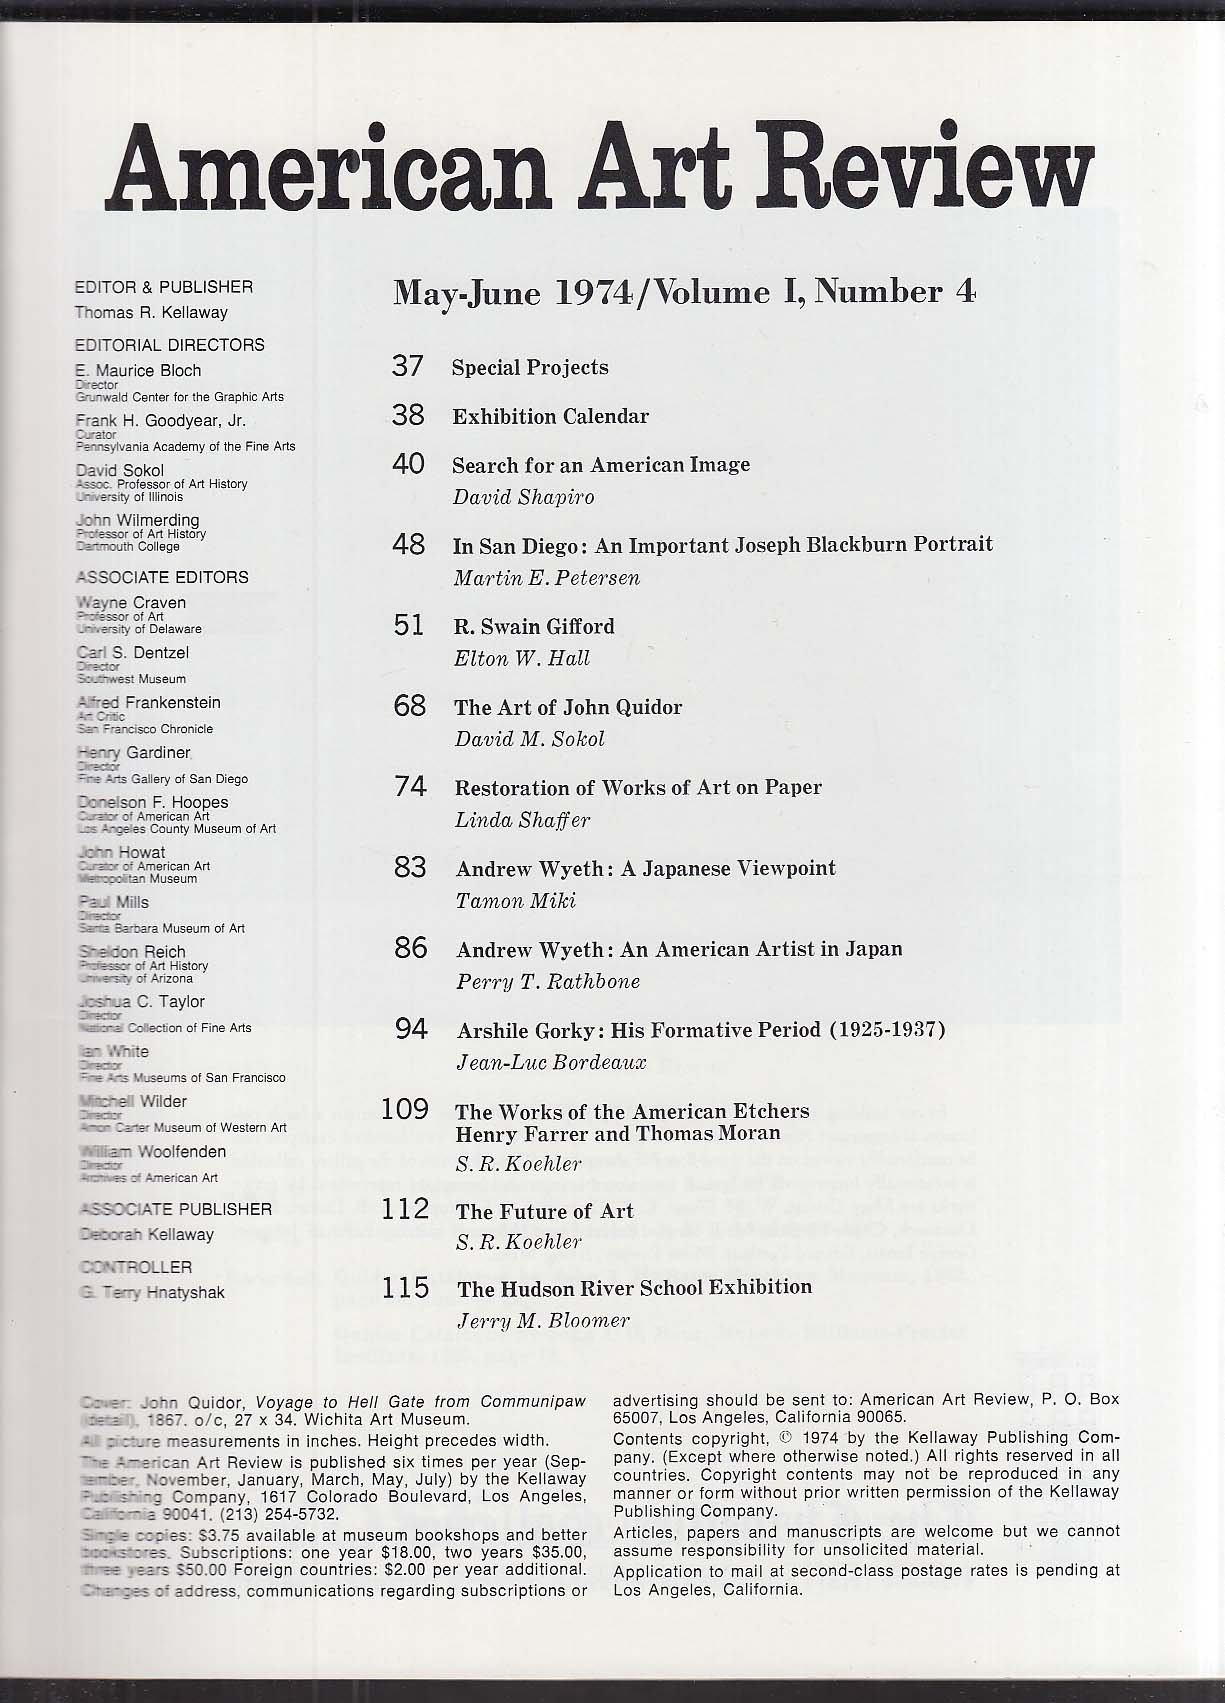 AMERICAN ART REVIEW John Quidor Andrew Wyeth Arshile Gorky ++ 5-6 1974